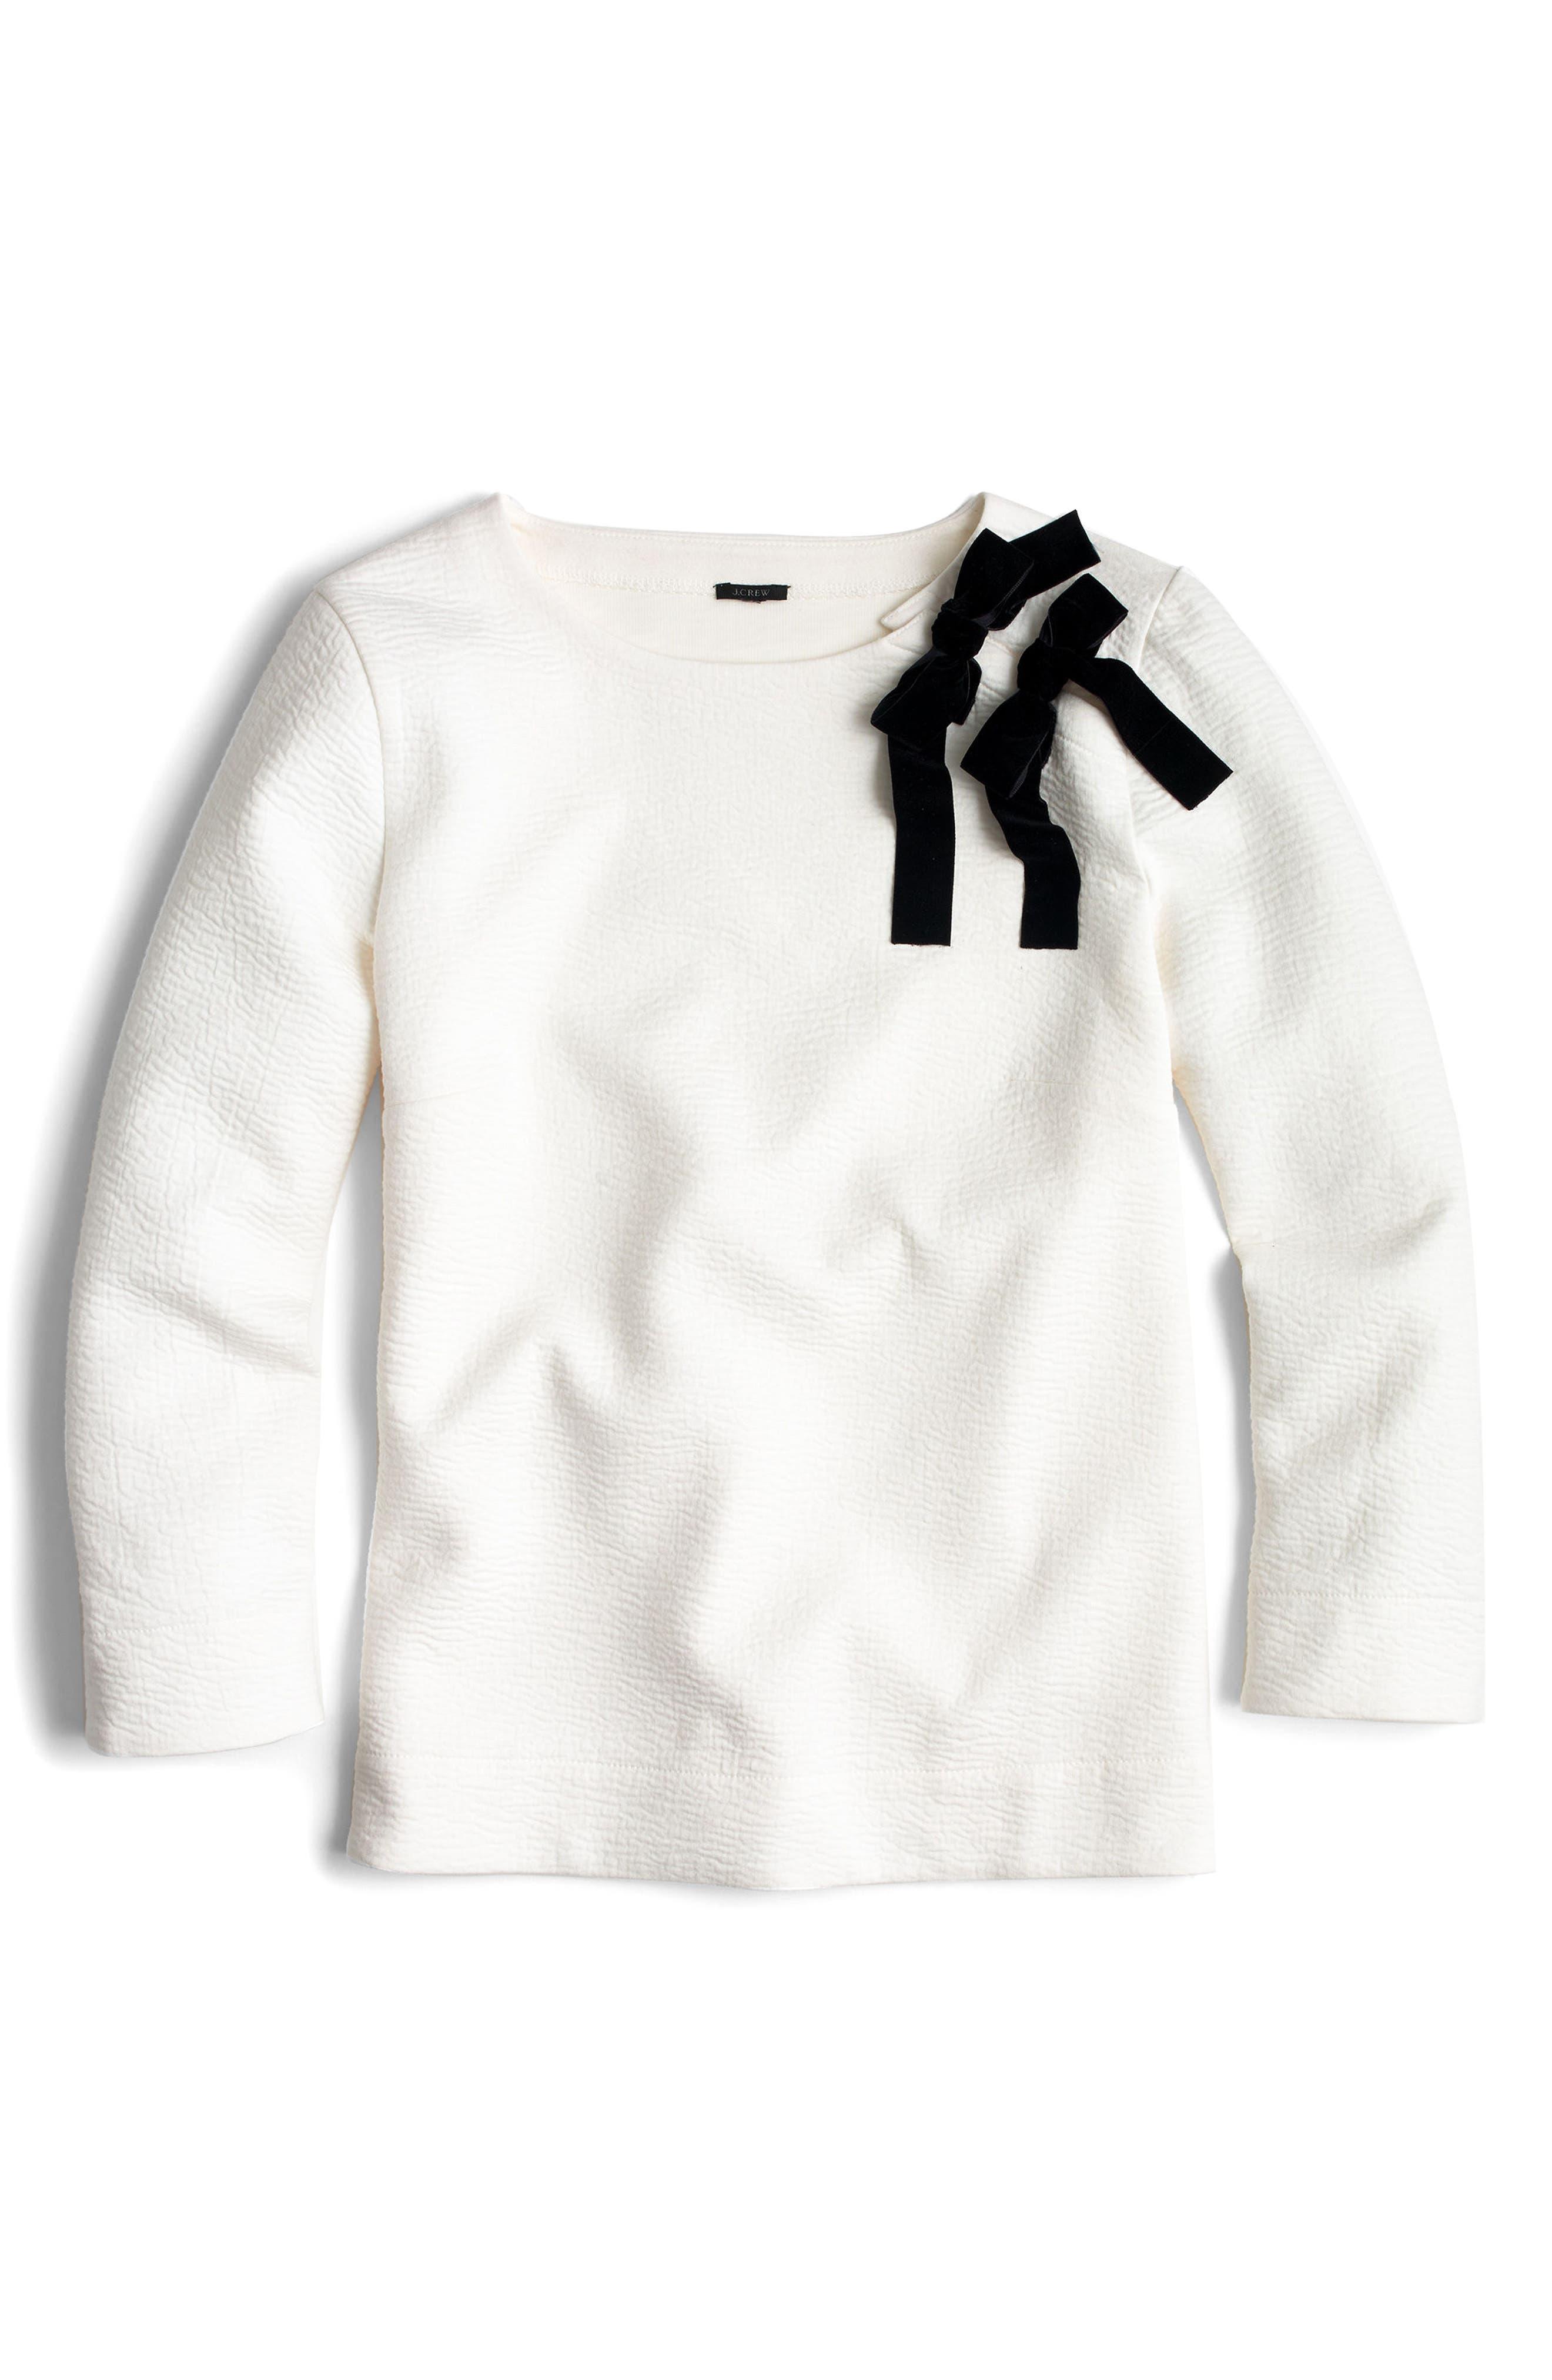 Main Image - J.Crew Double Bow Sweatshirt